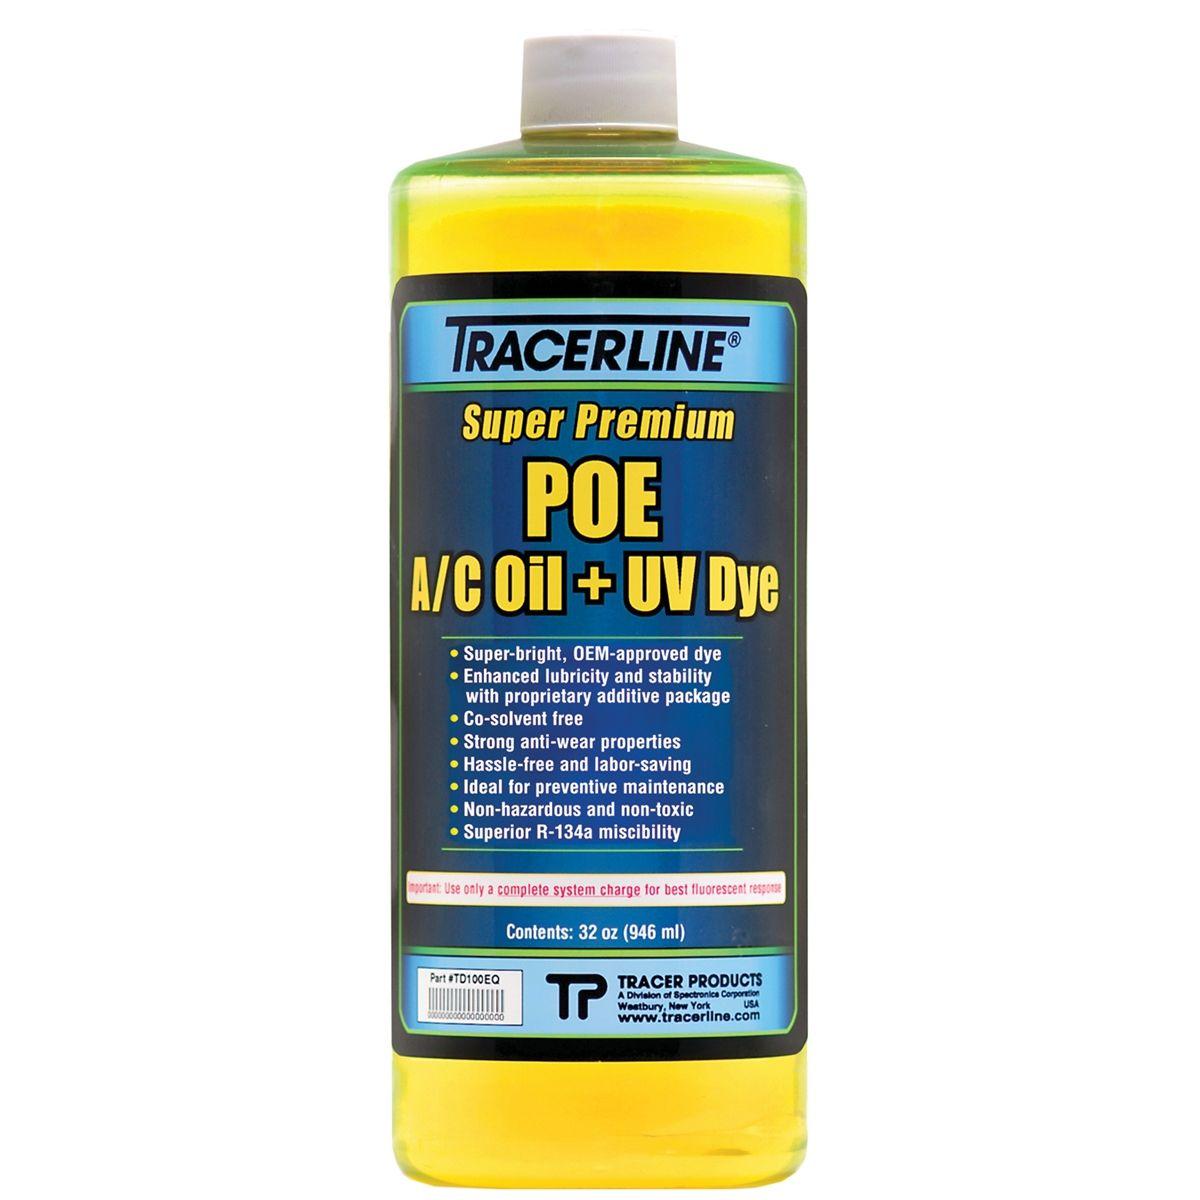 Tracer Products 32 OZ BOTTLE POE A/C OIL W/DYE TD100EQ